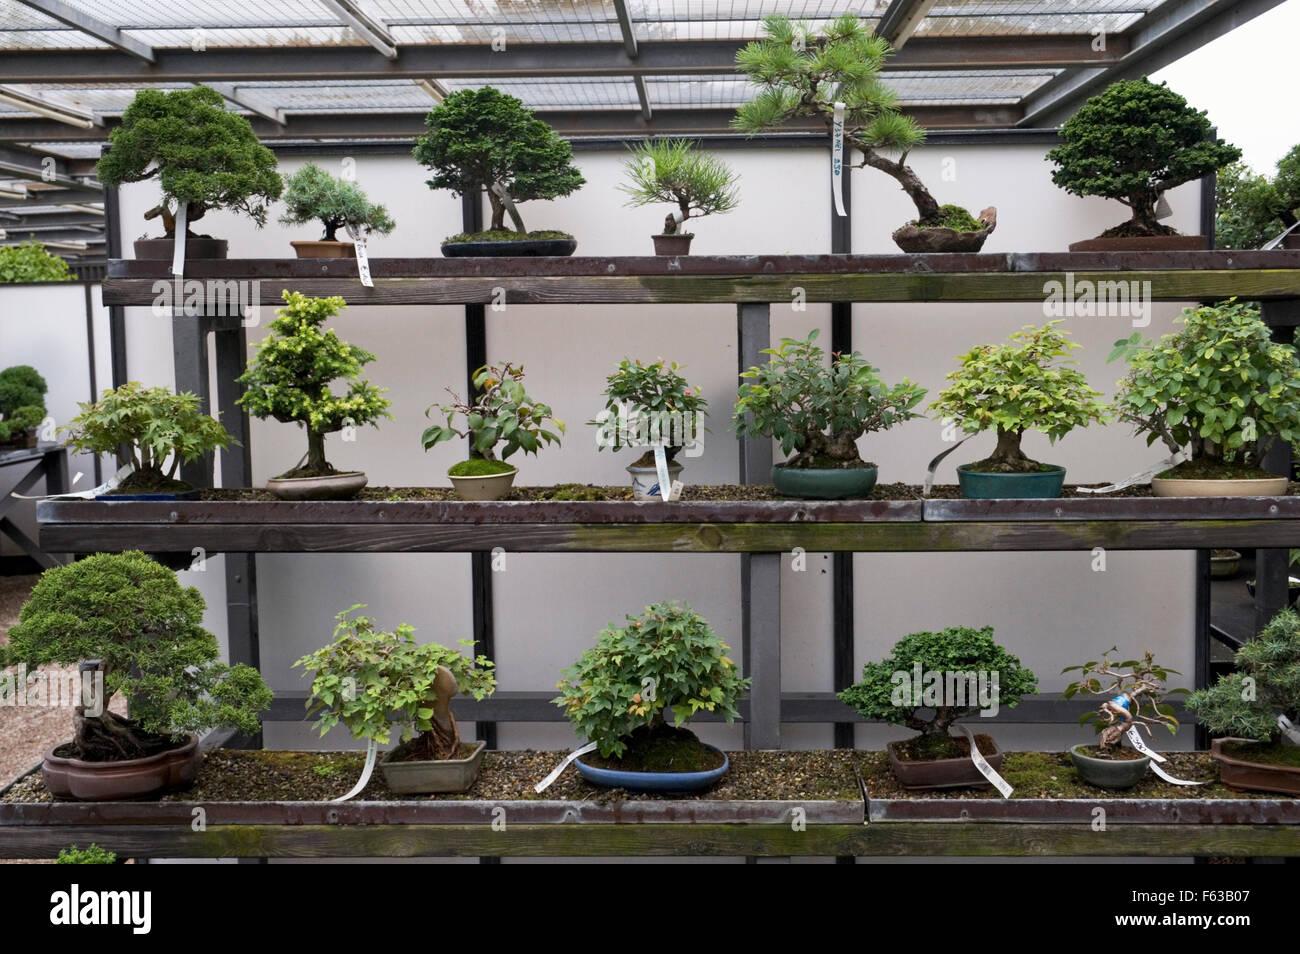 bonsai display stockfotos bonsai display bilder alamy. Black Bedroom Furniture Sets. Home Design Ideas